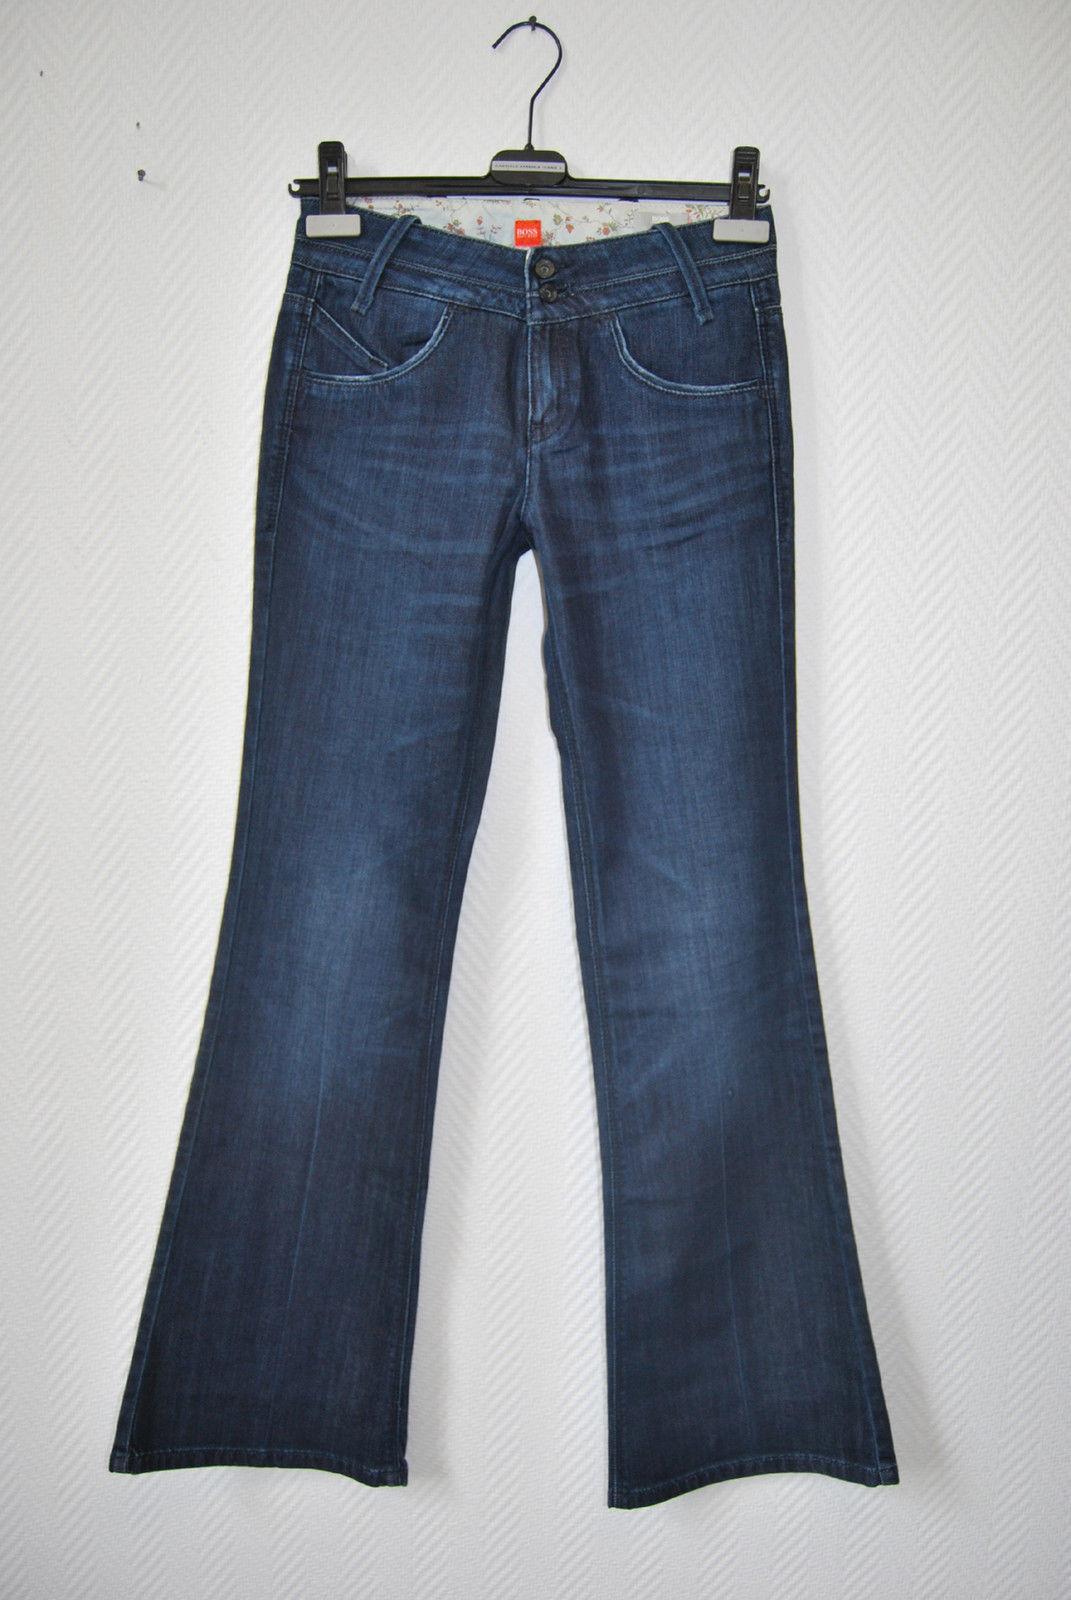 Hugo BOSS Jeans Hose 36 W27 L34 Dunkel Stretch FLArot Schlag 189 - EDEL  D1516